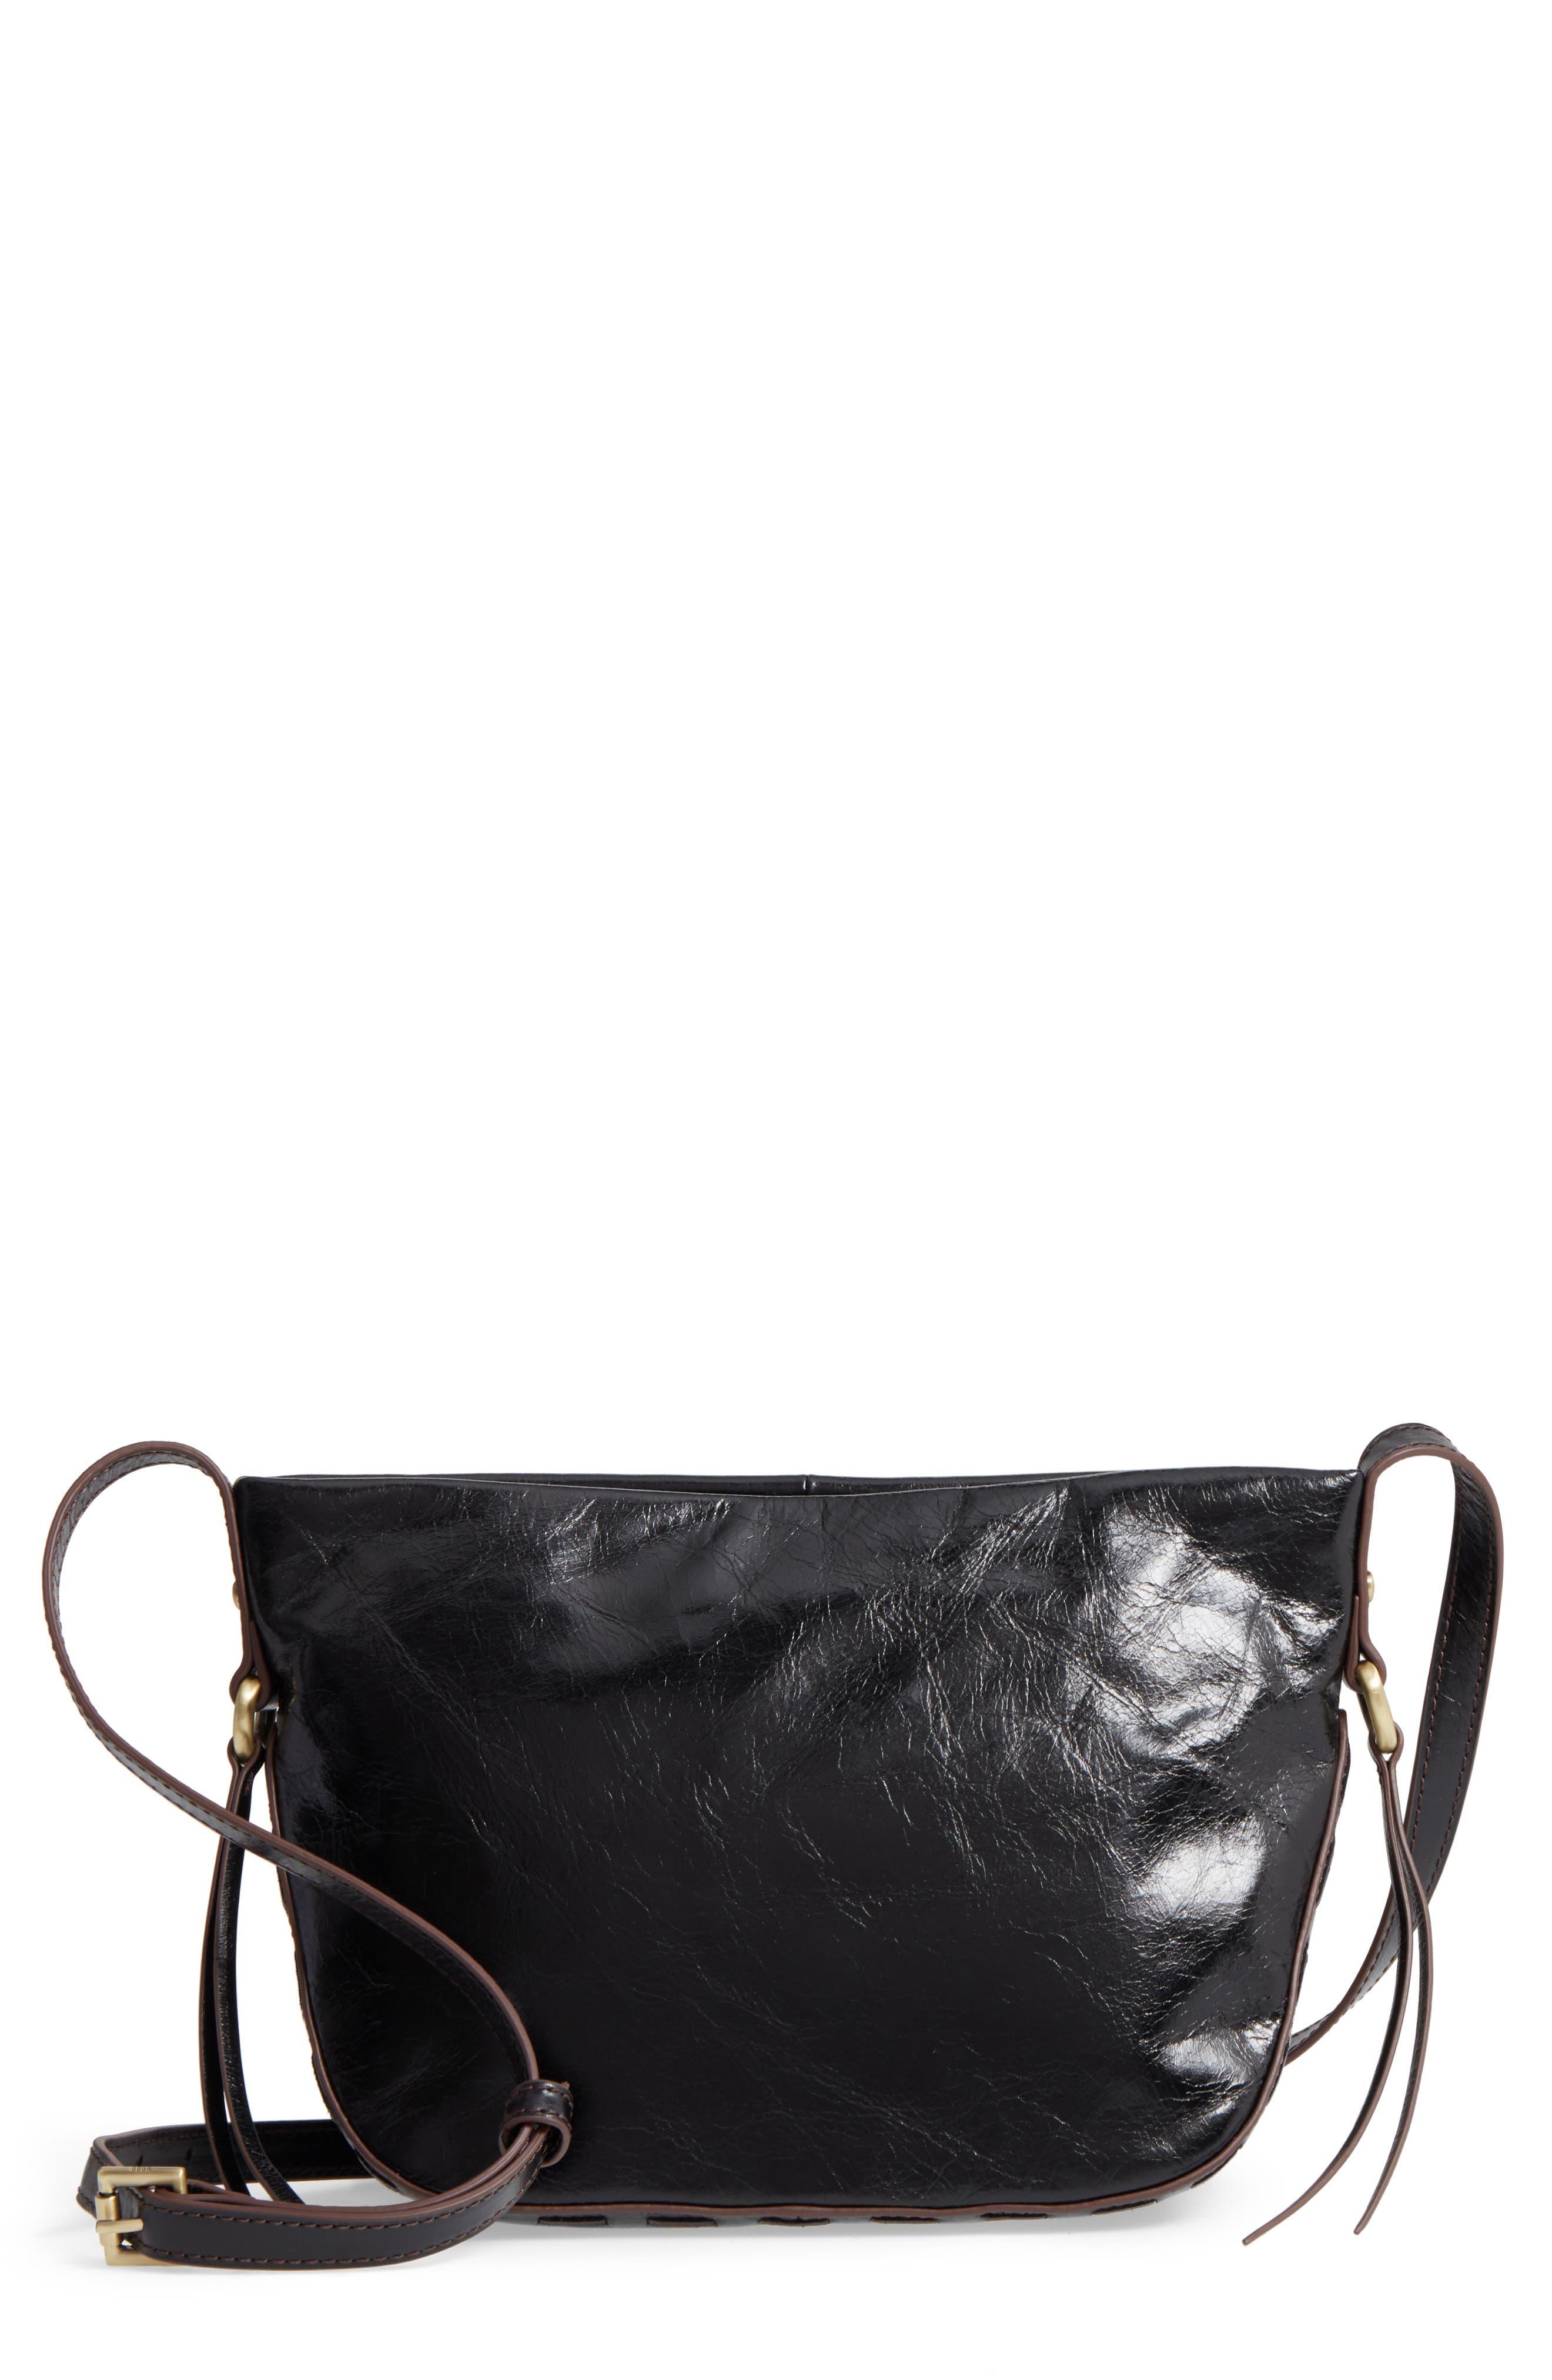 Muse Calfskin Leather Crossbody Bag,                             Main thumbnail 1, color,                             001